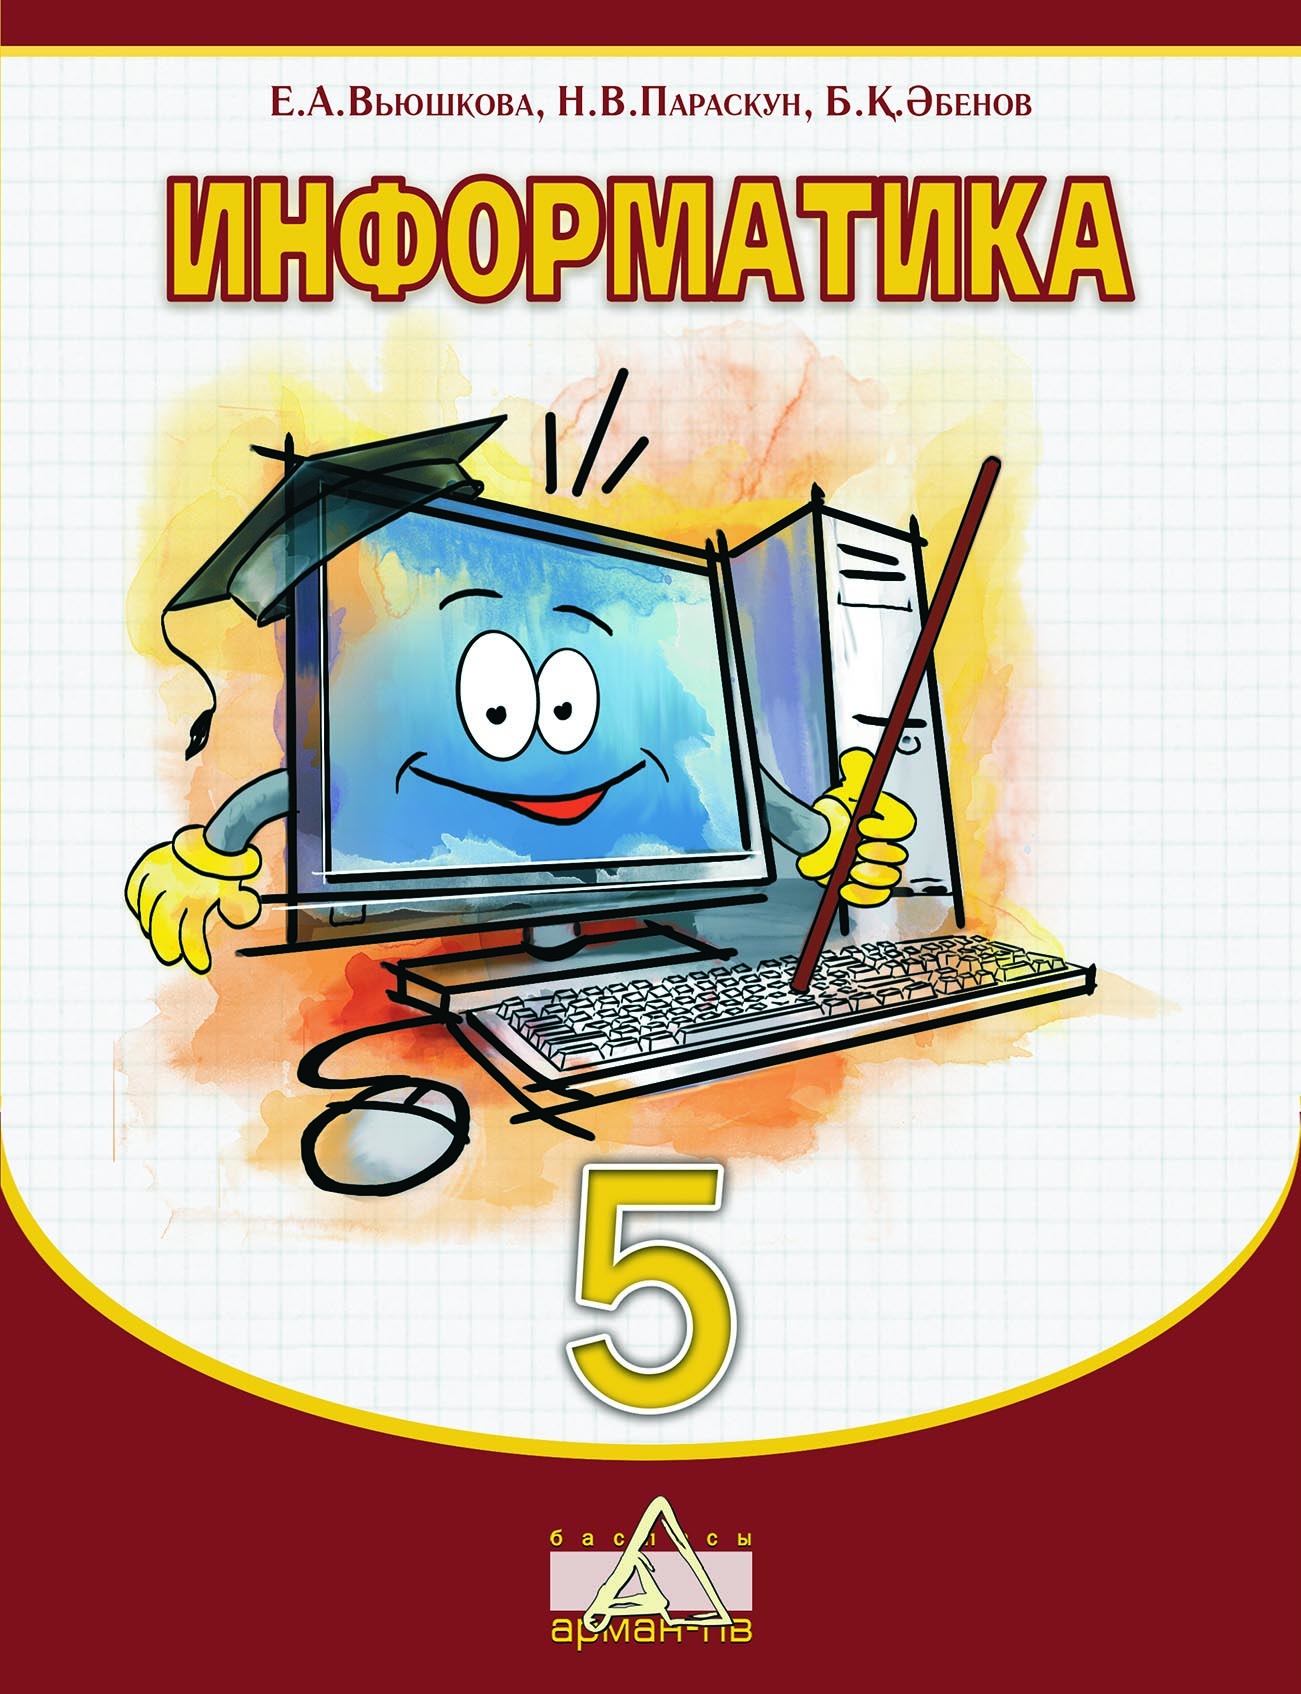 705-002-002к-13-Информатика-5-каз-УЧЕБНИК_obl1.jpg